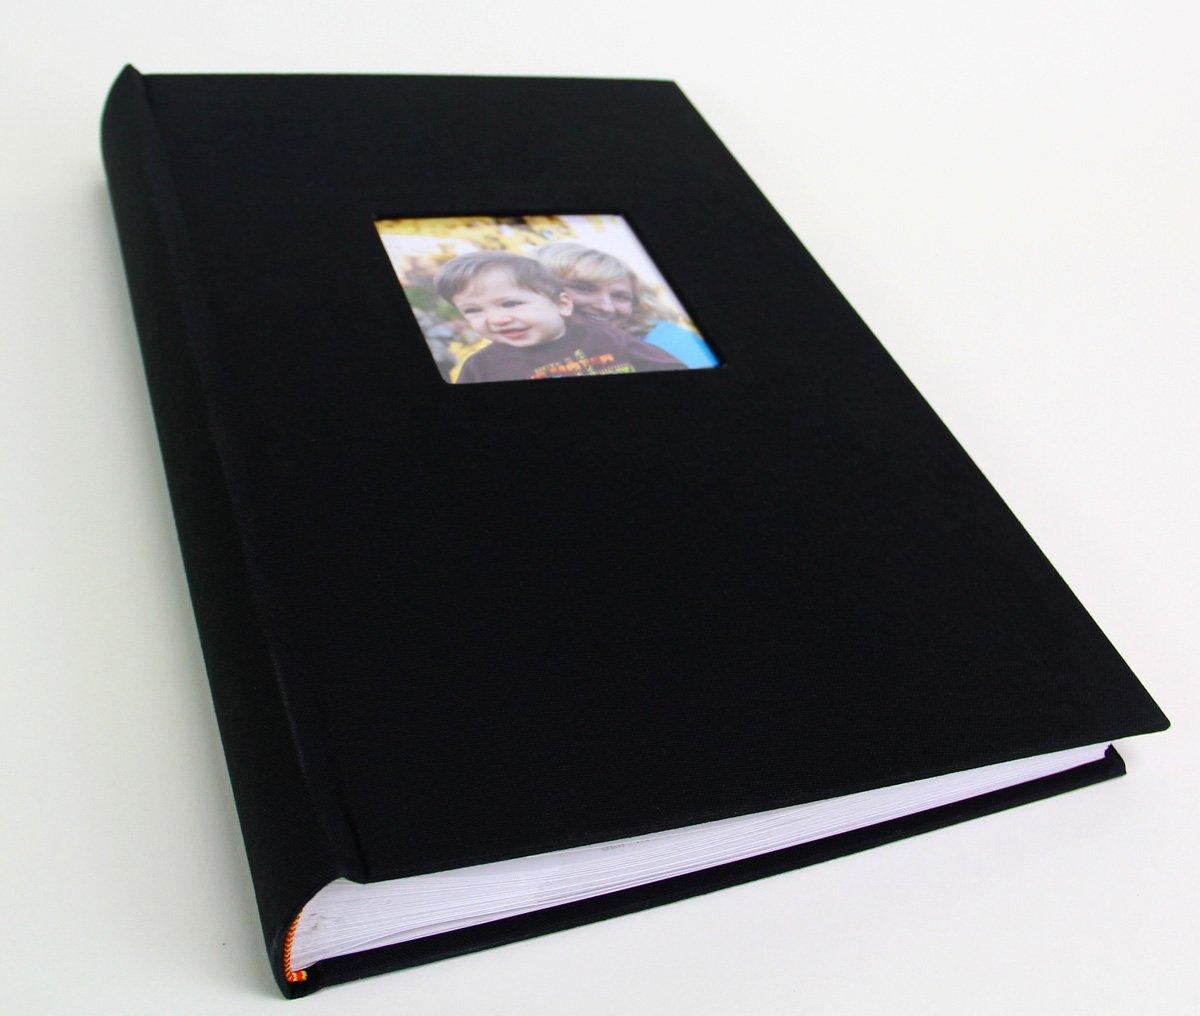 Deluxe Cloth Fabric Photo Album 4x6 300 Plastic Slip-in Pockets with Memo Spa... Sunline